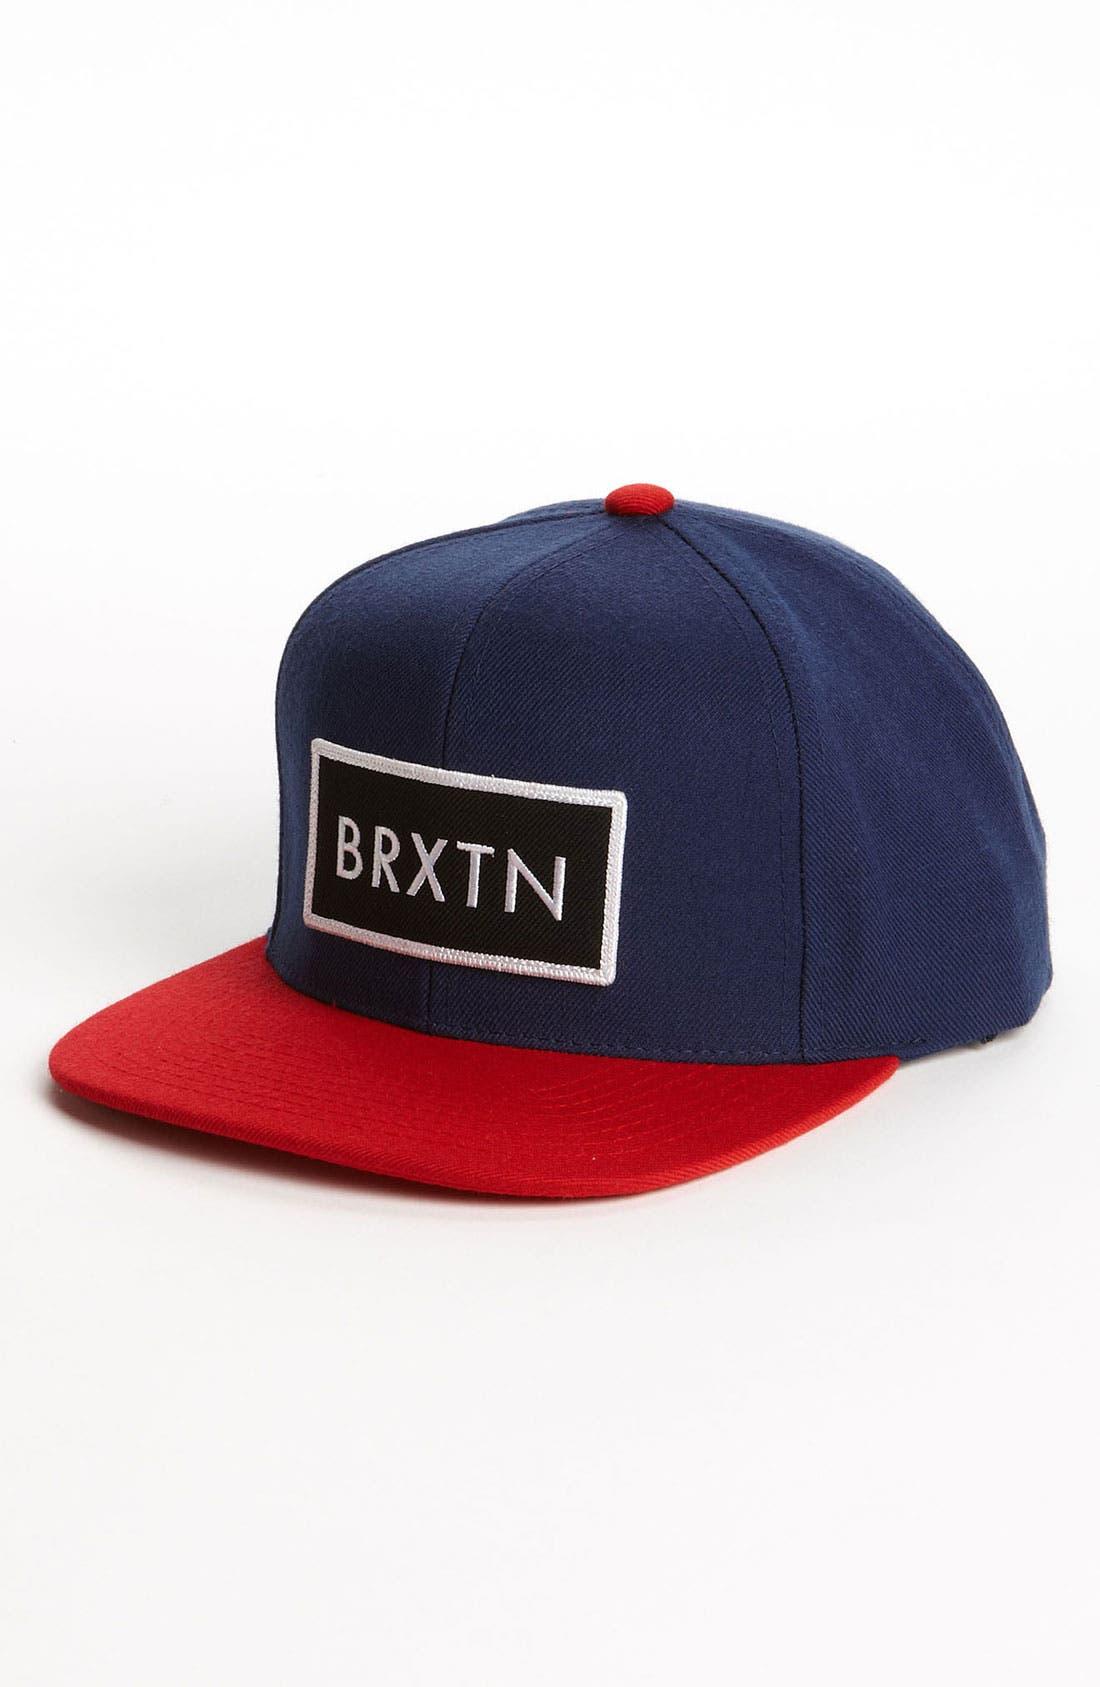 Alternate Image 1 Selected - Brixton 'Rift' Snapback Baseball Cap